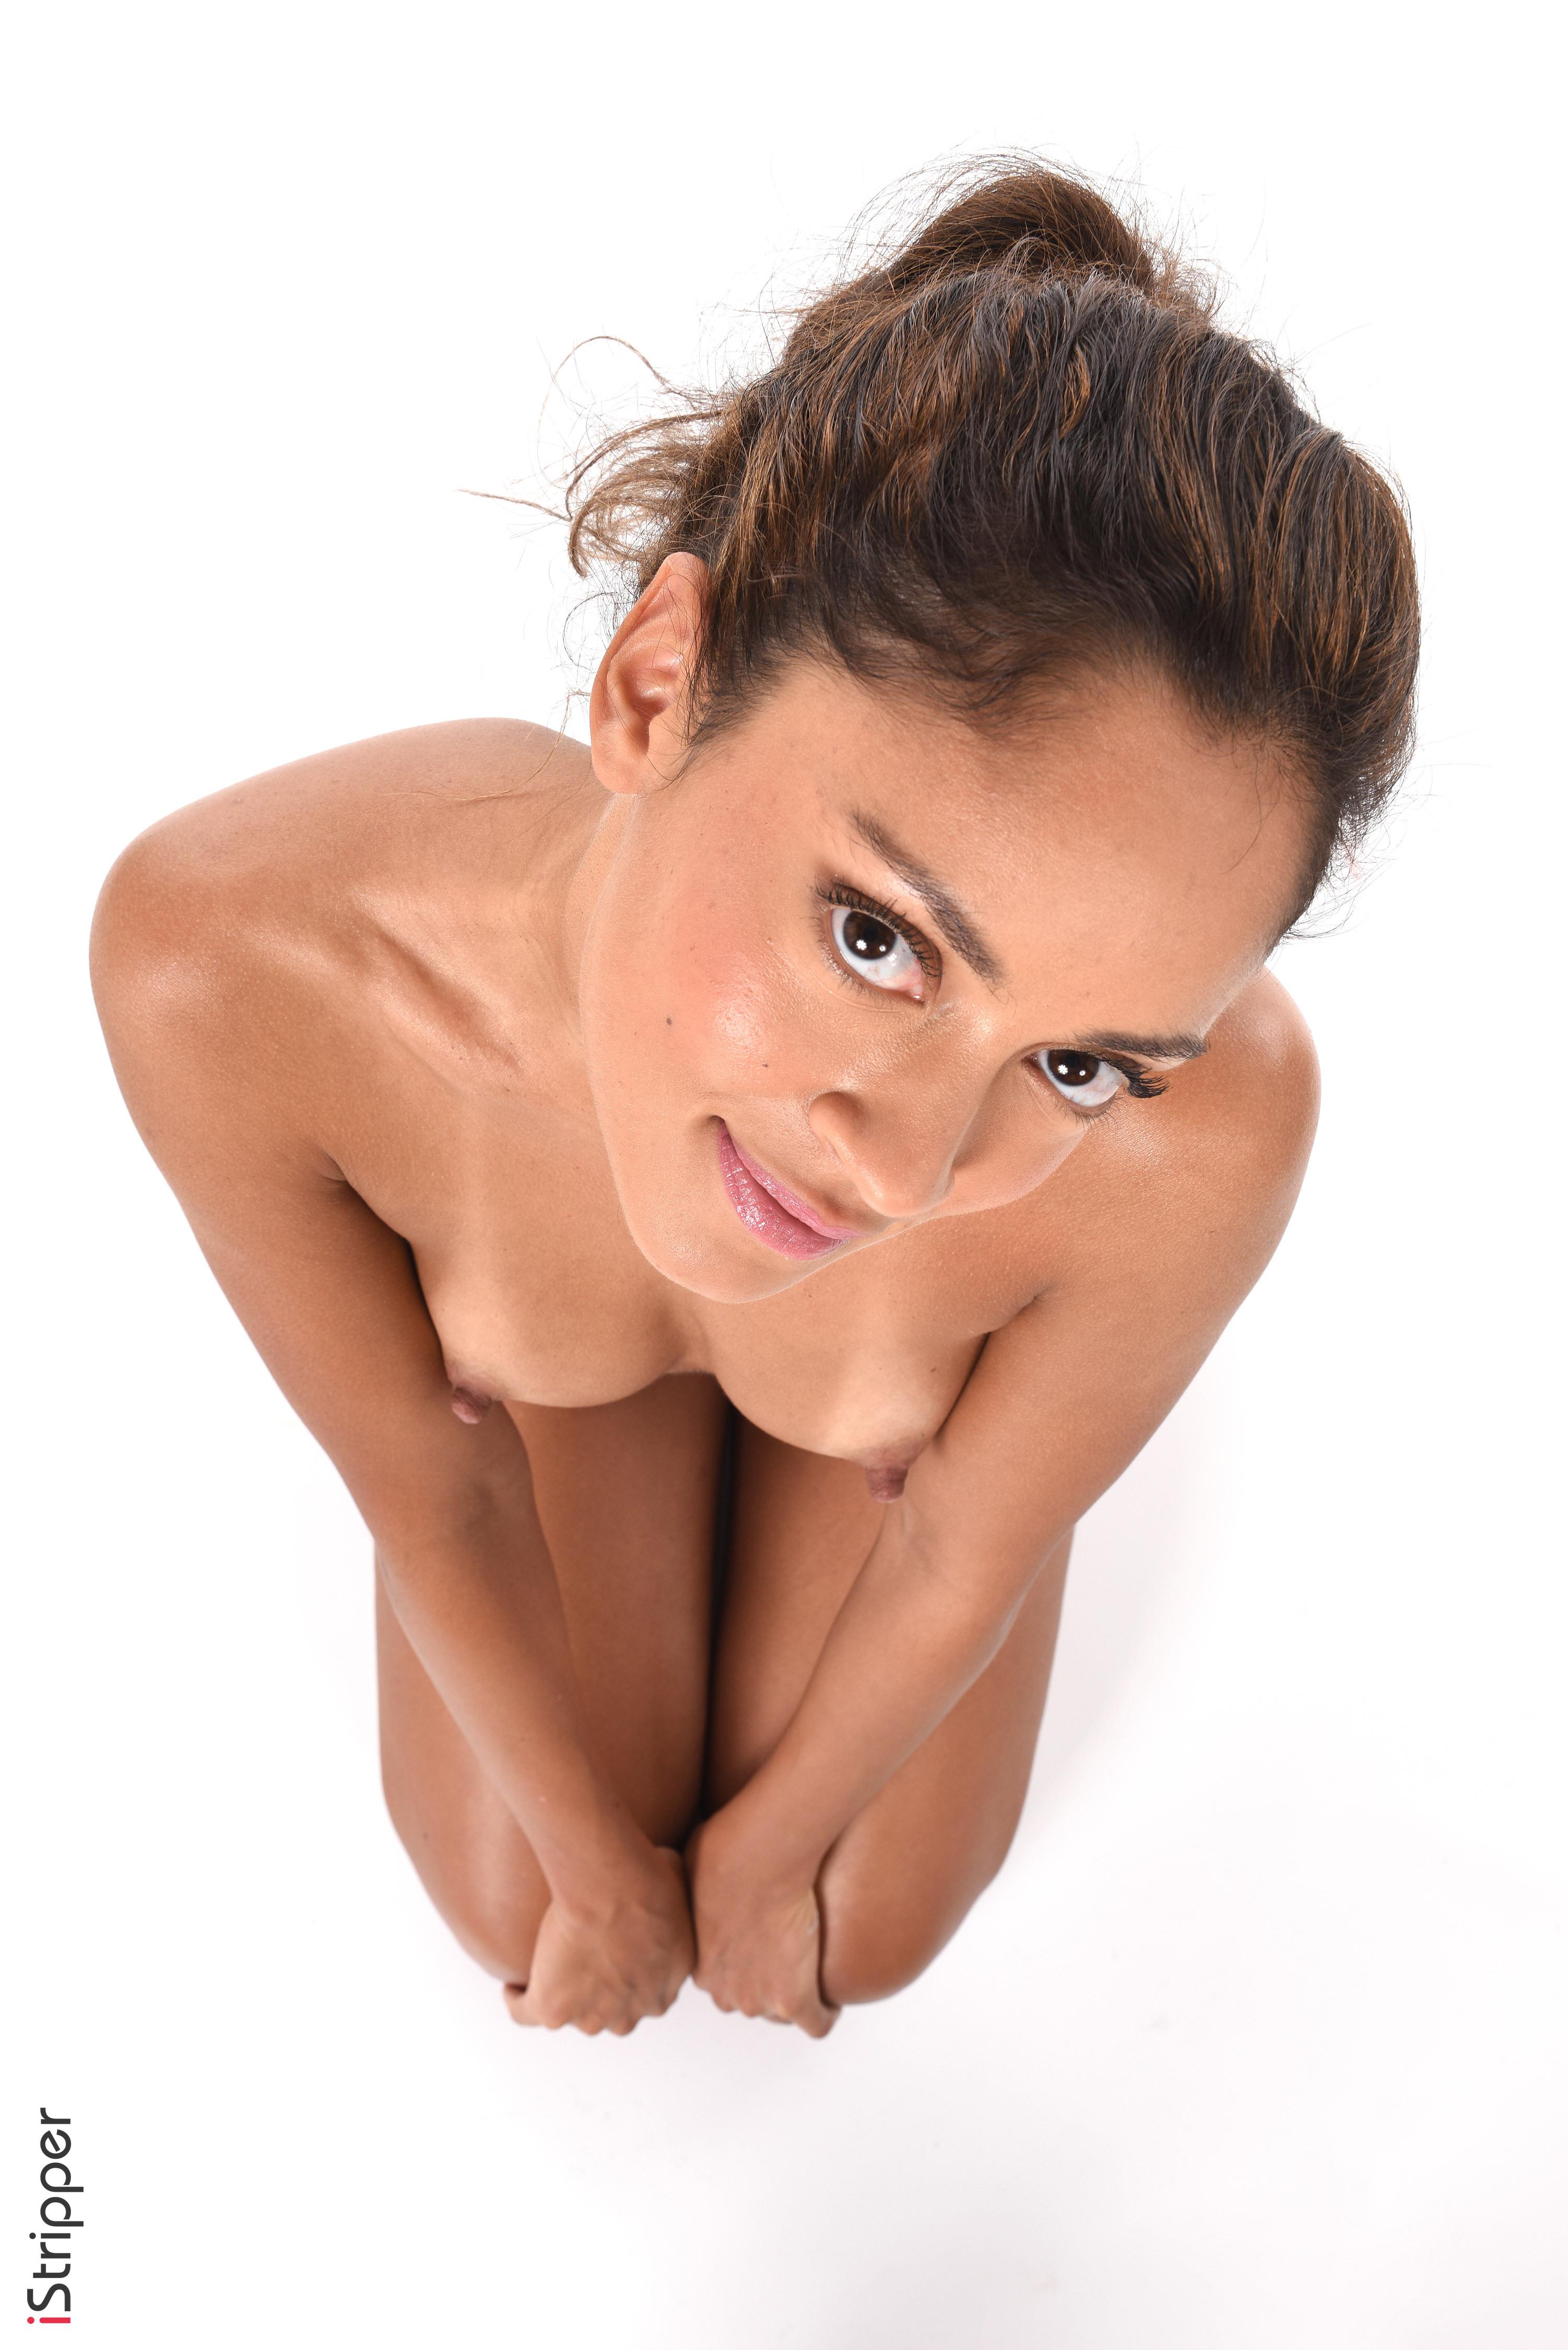 pics of shaved vagina